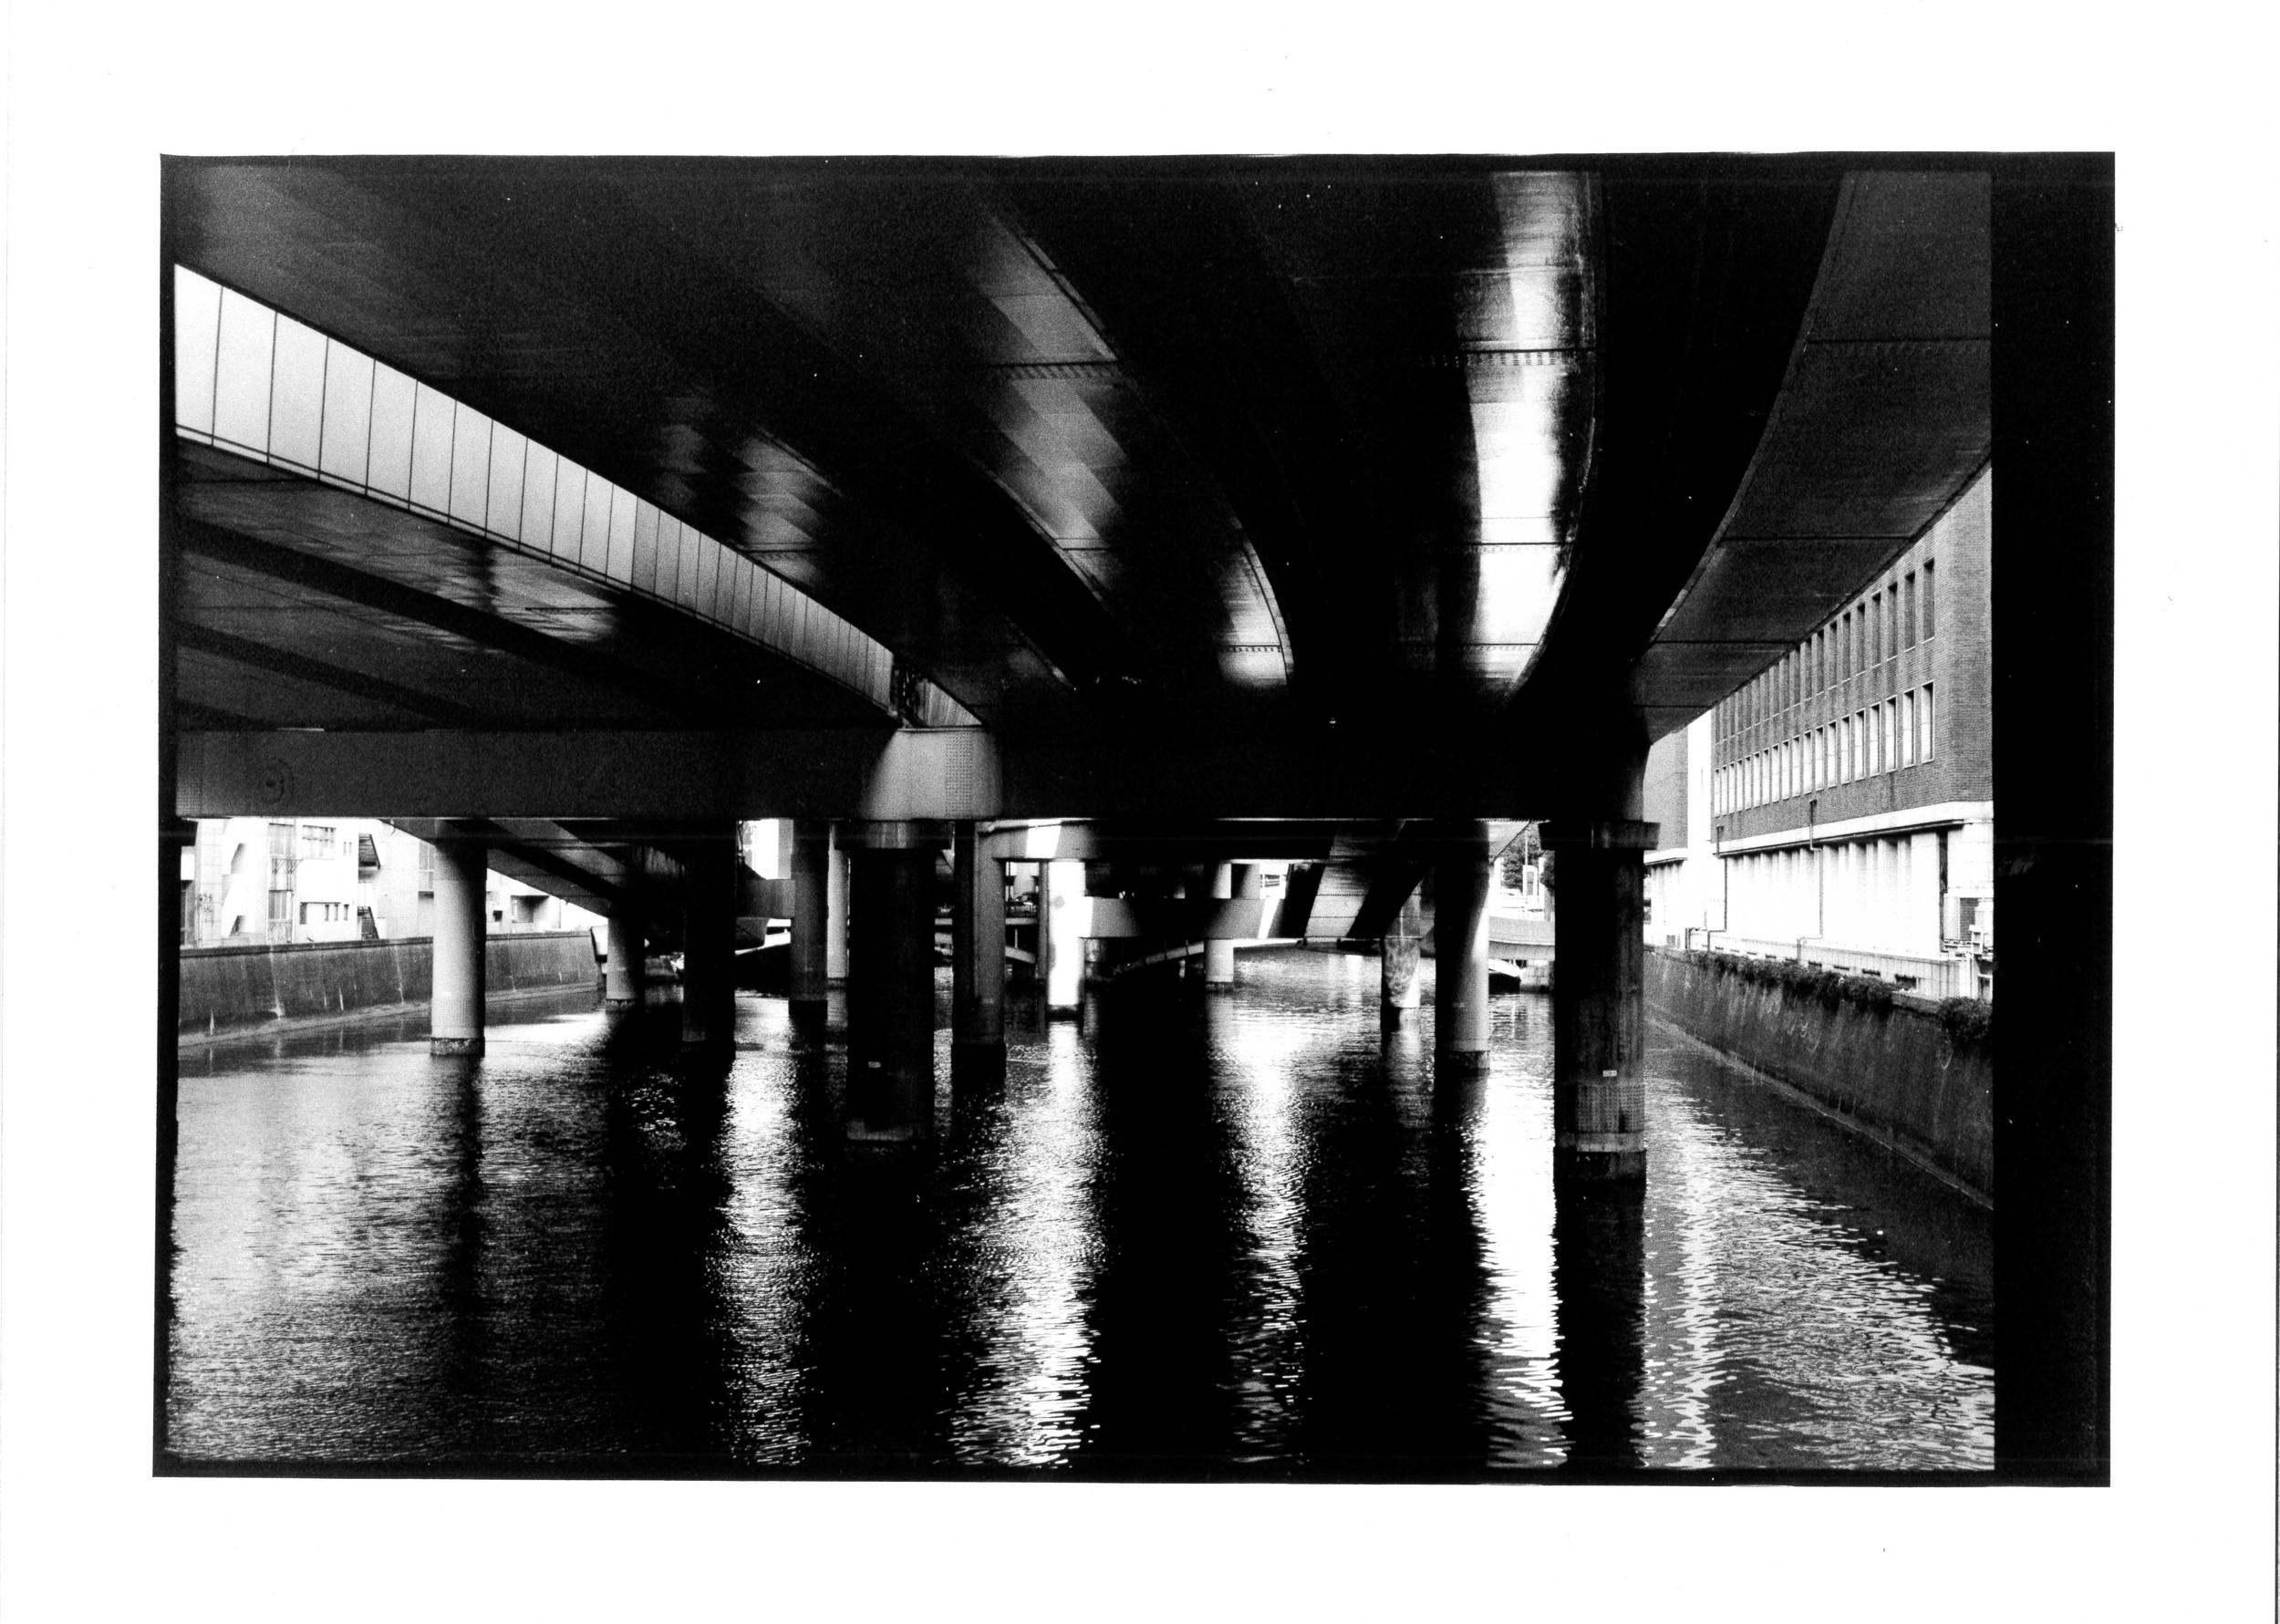 Tokyo river, 2010 24x36 cm